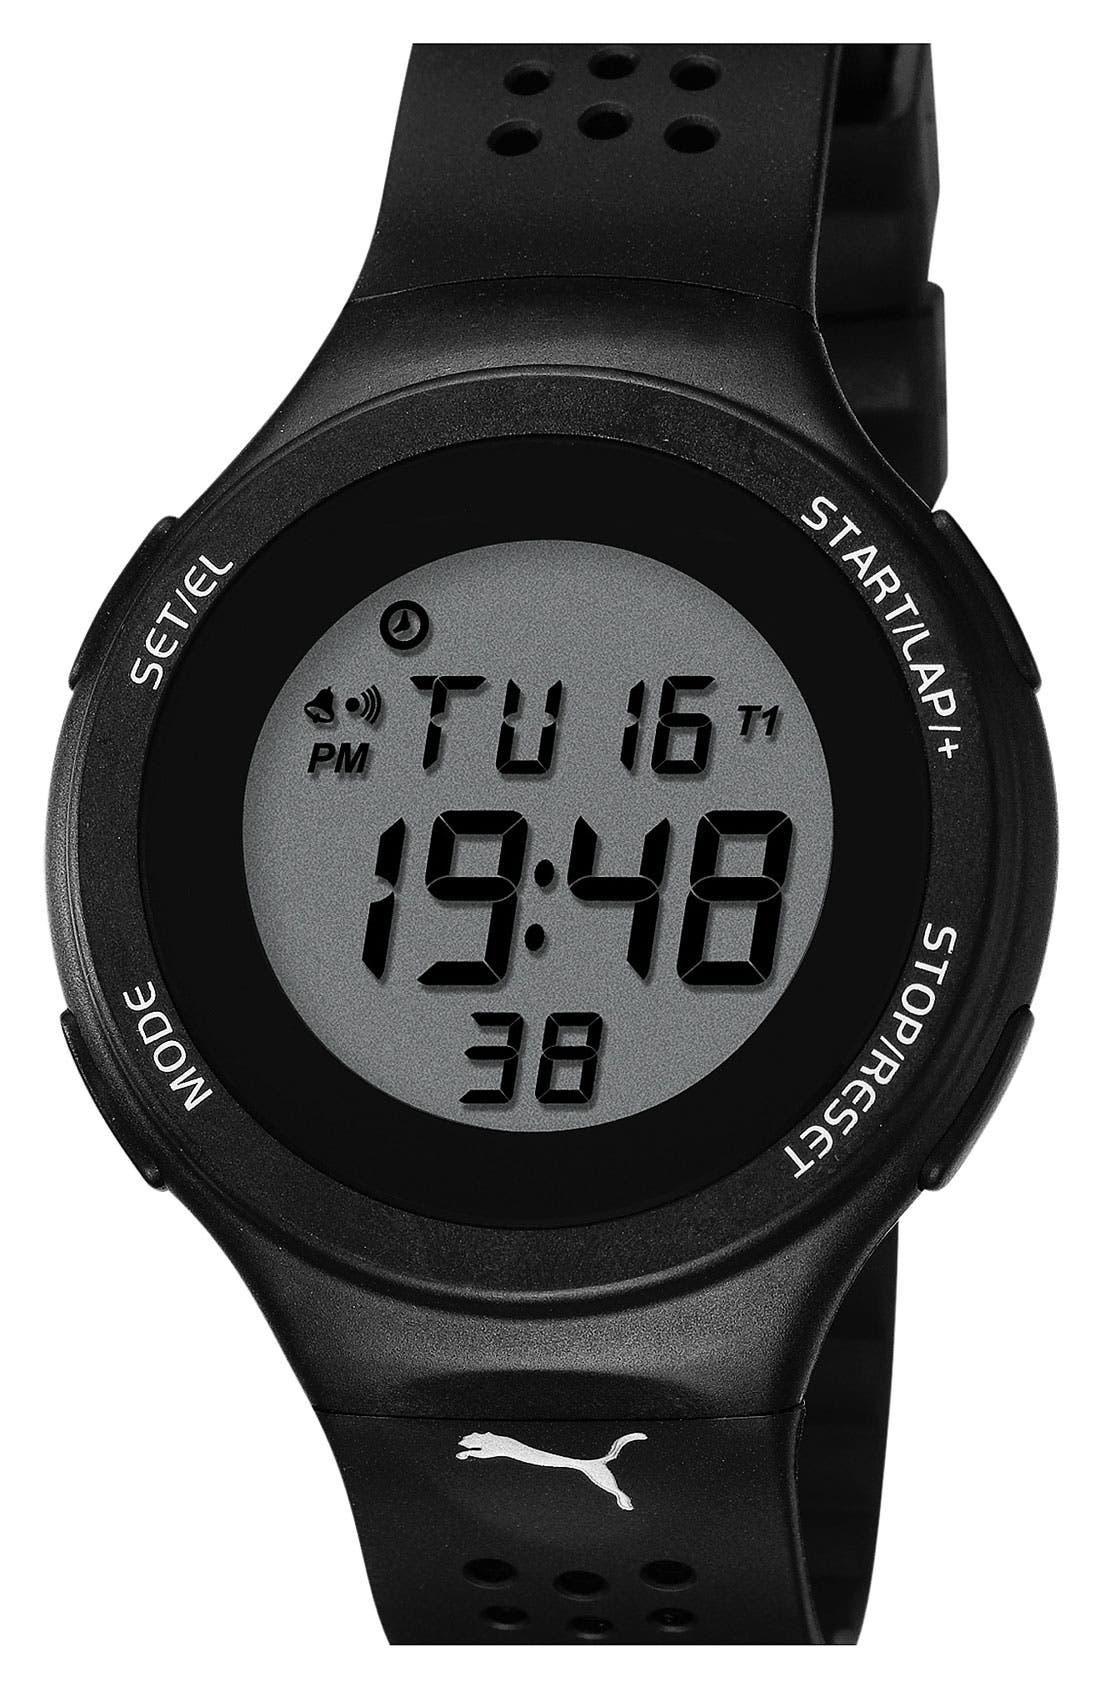 Alternate Image 1 Selected - PUMA 'Faas 200' Digital Sport Watch, 44mm